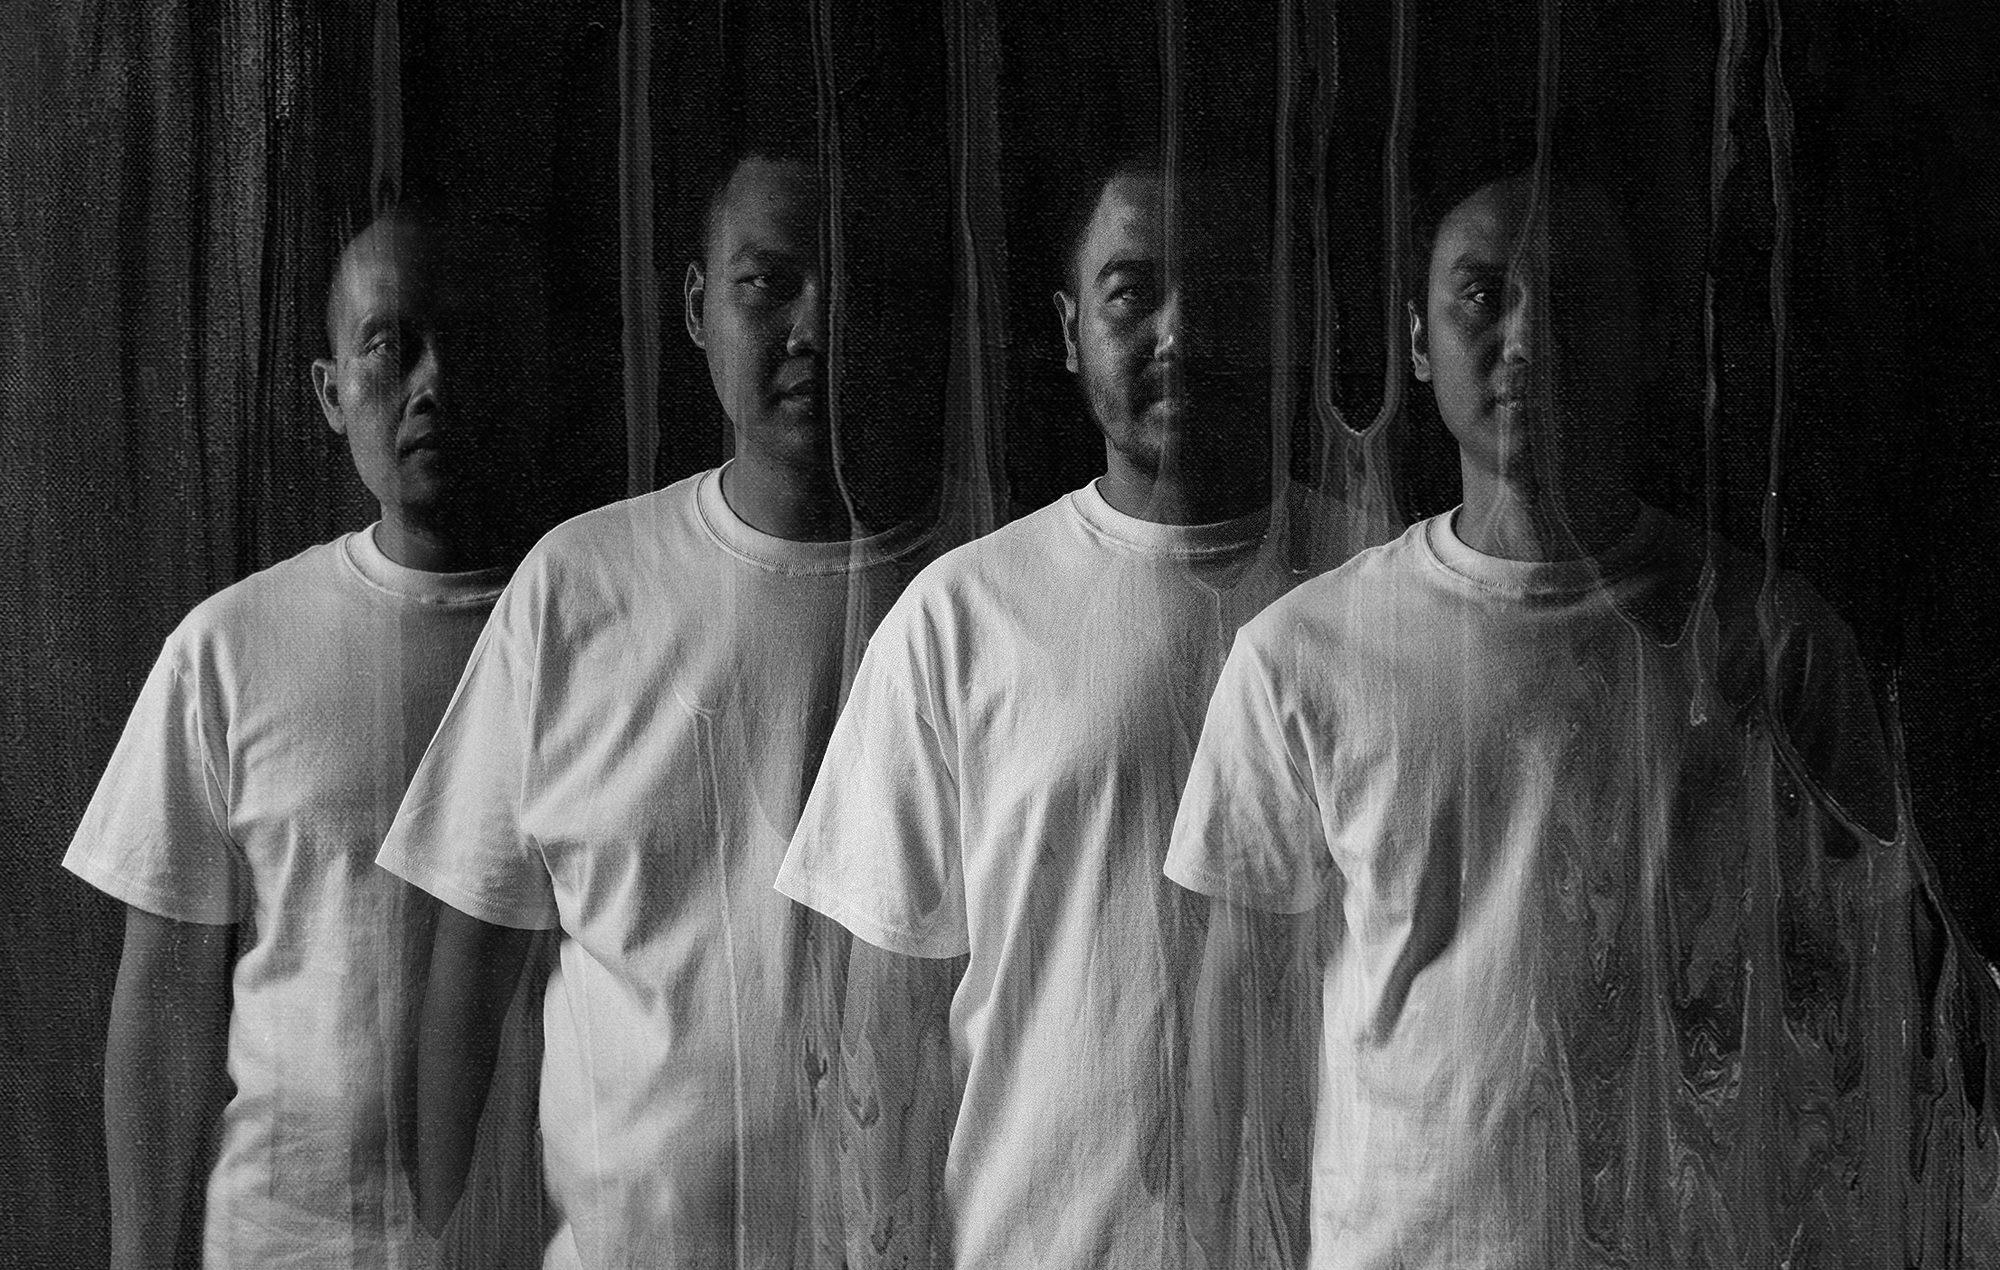 Ssslothhh Grimloc Records 10th anniversary anthology Dasawarsa Kebisingan